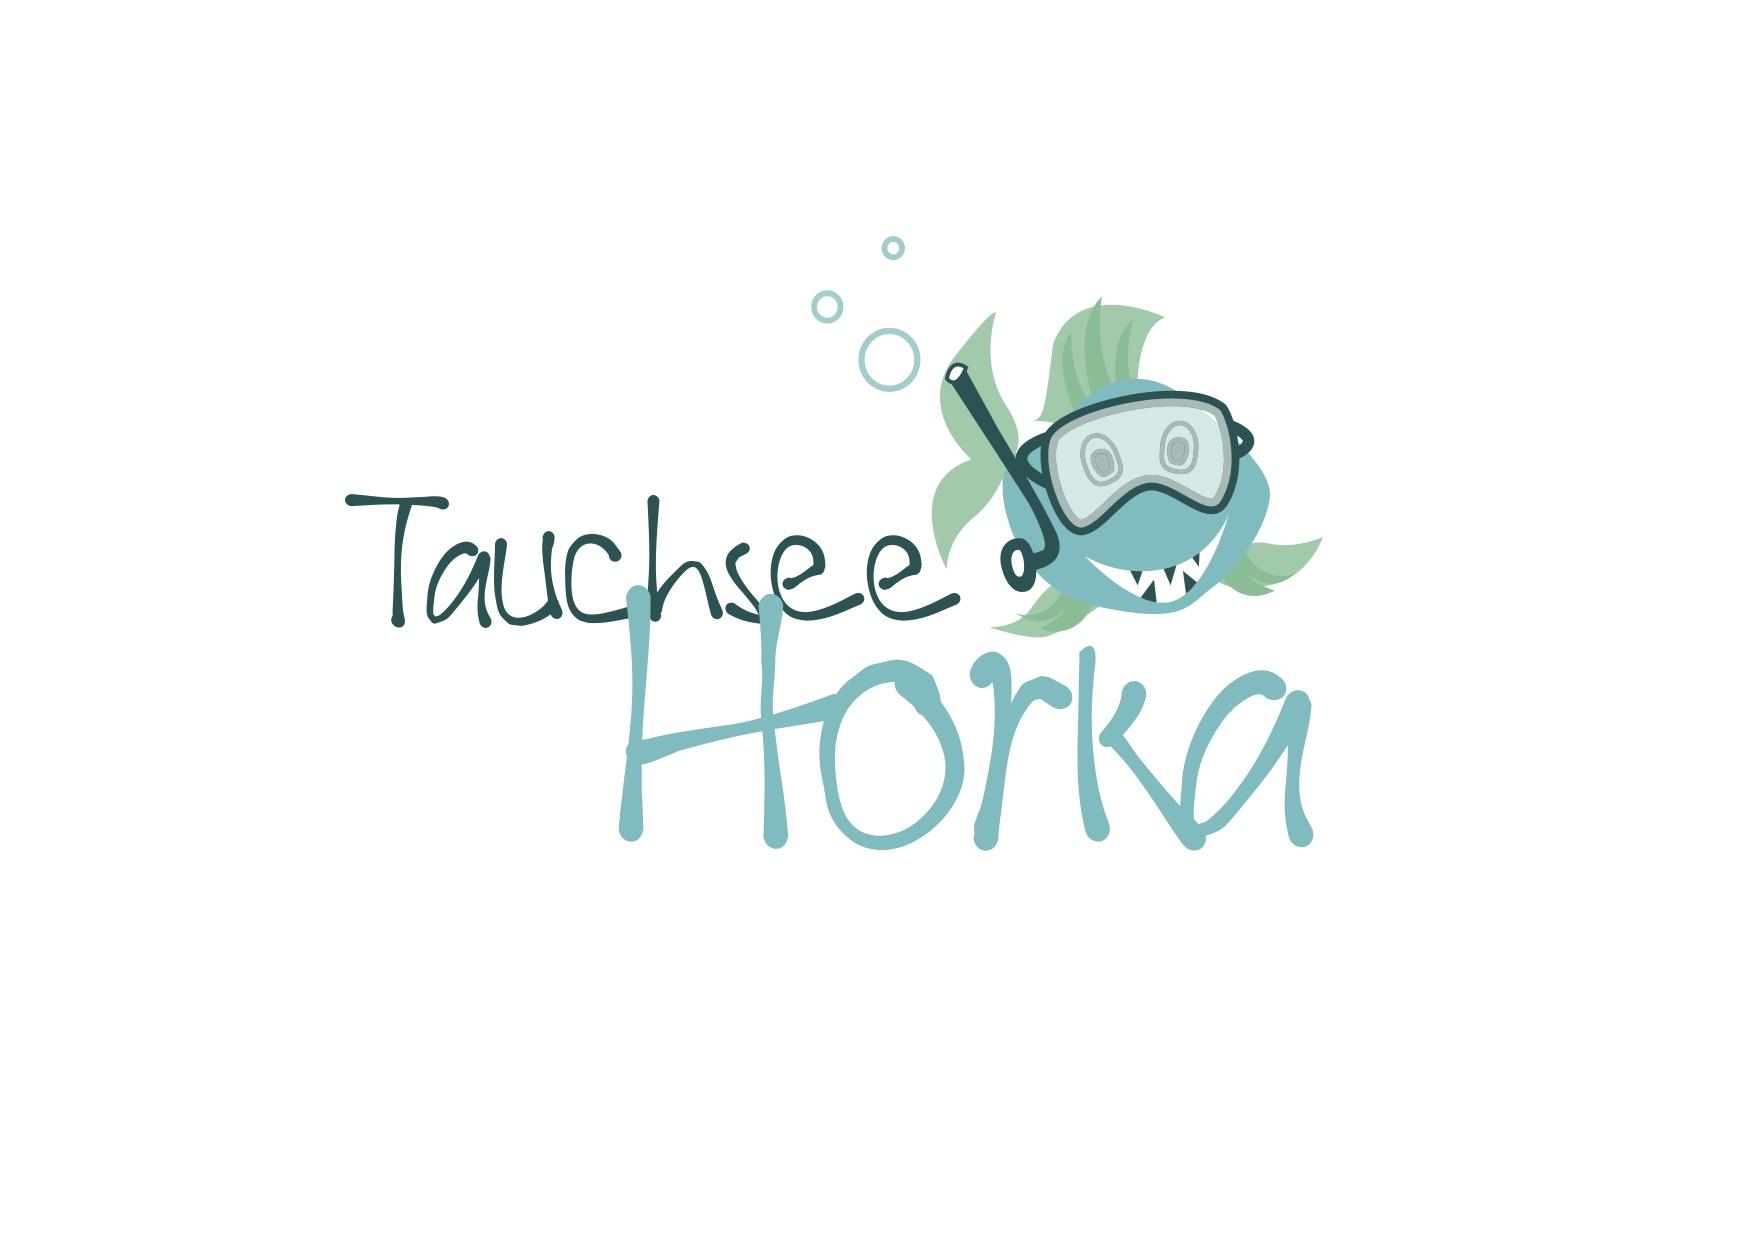 Tauchesee Horka